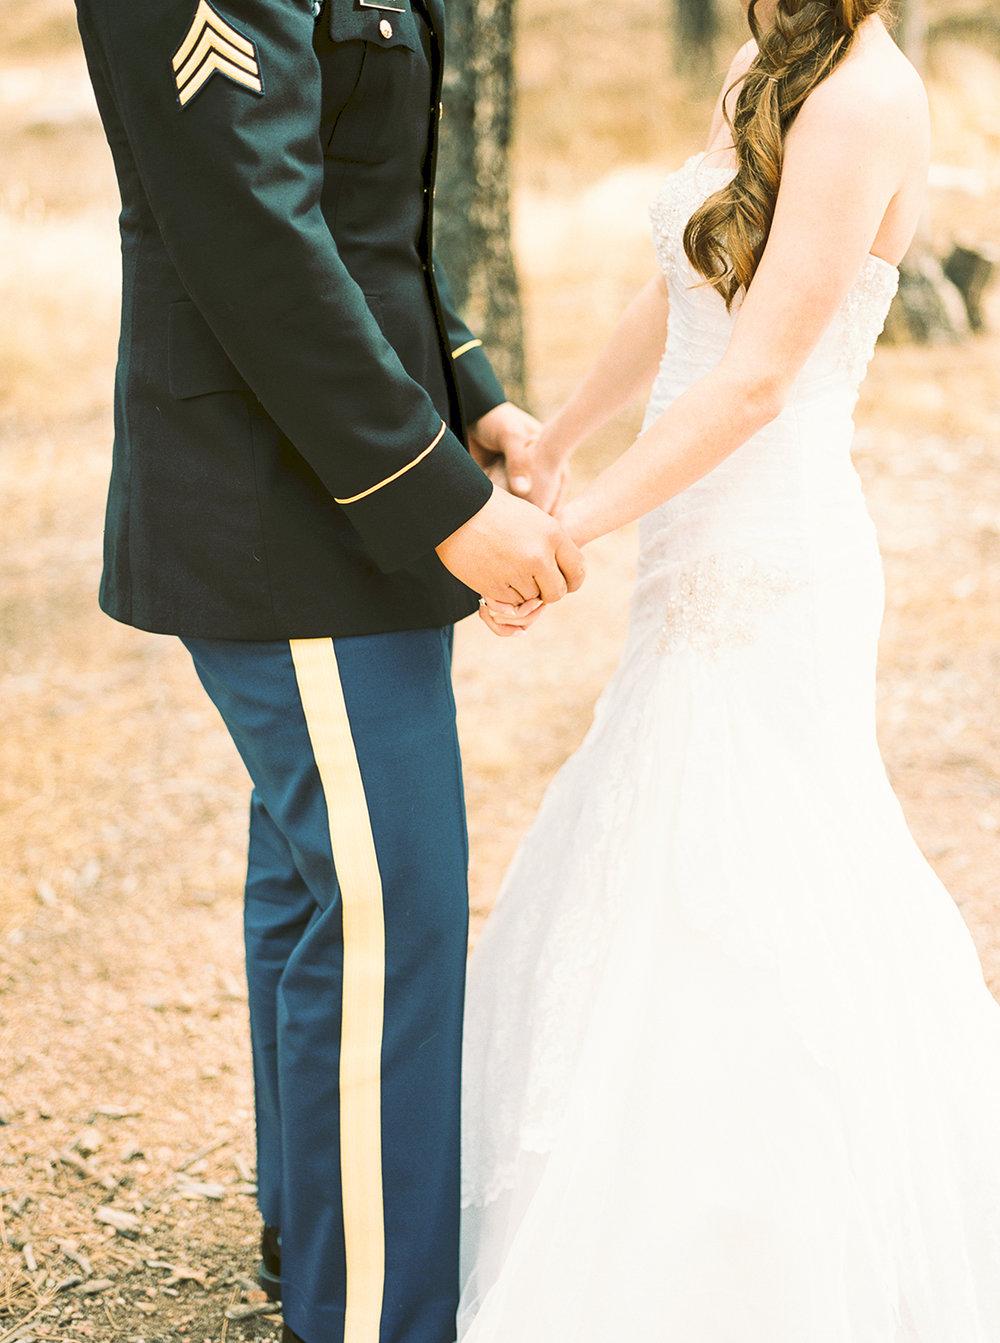 colorado-springs-military-wedding-skylar-rain-photography-j-d-3.jpg